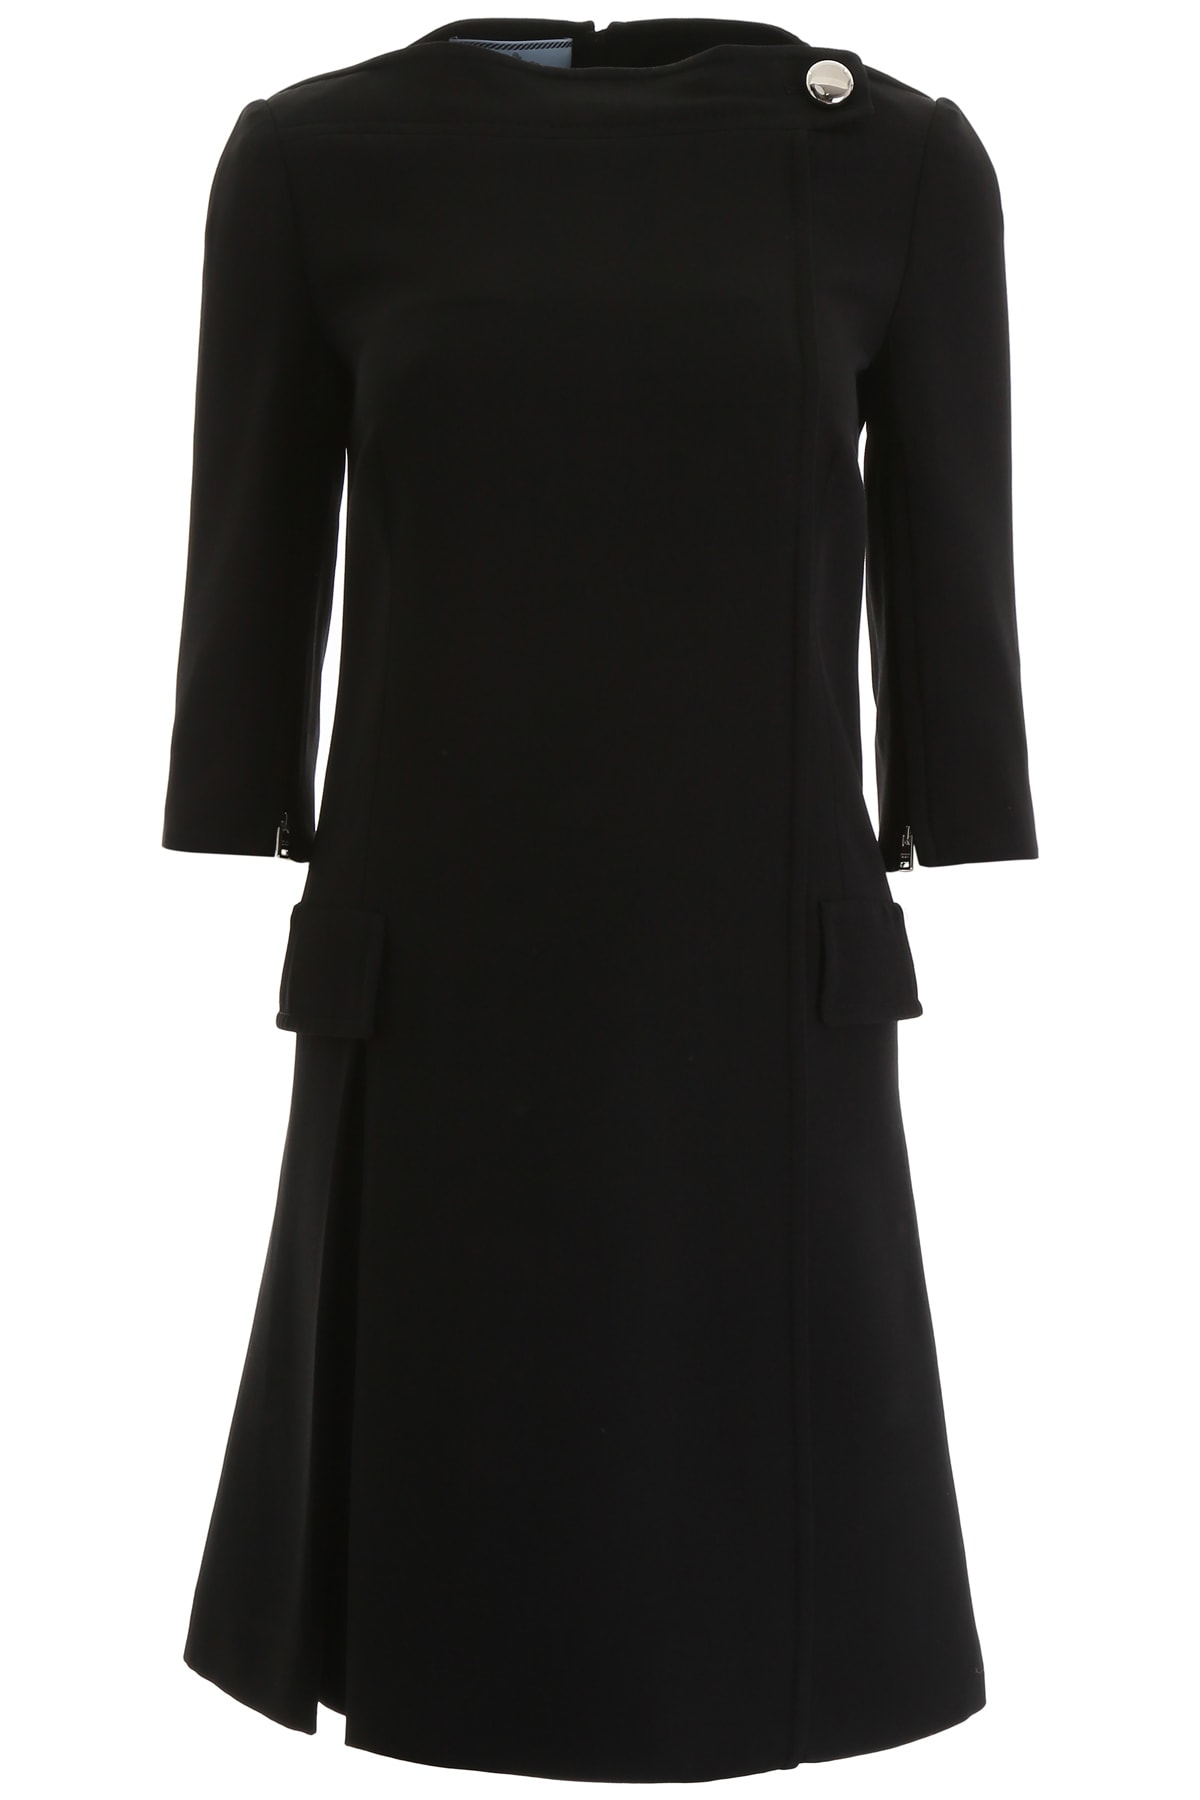 Buy Prada Cady Dress online, shop Prada with free shipping